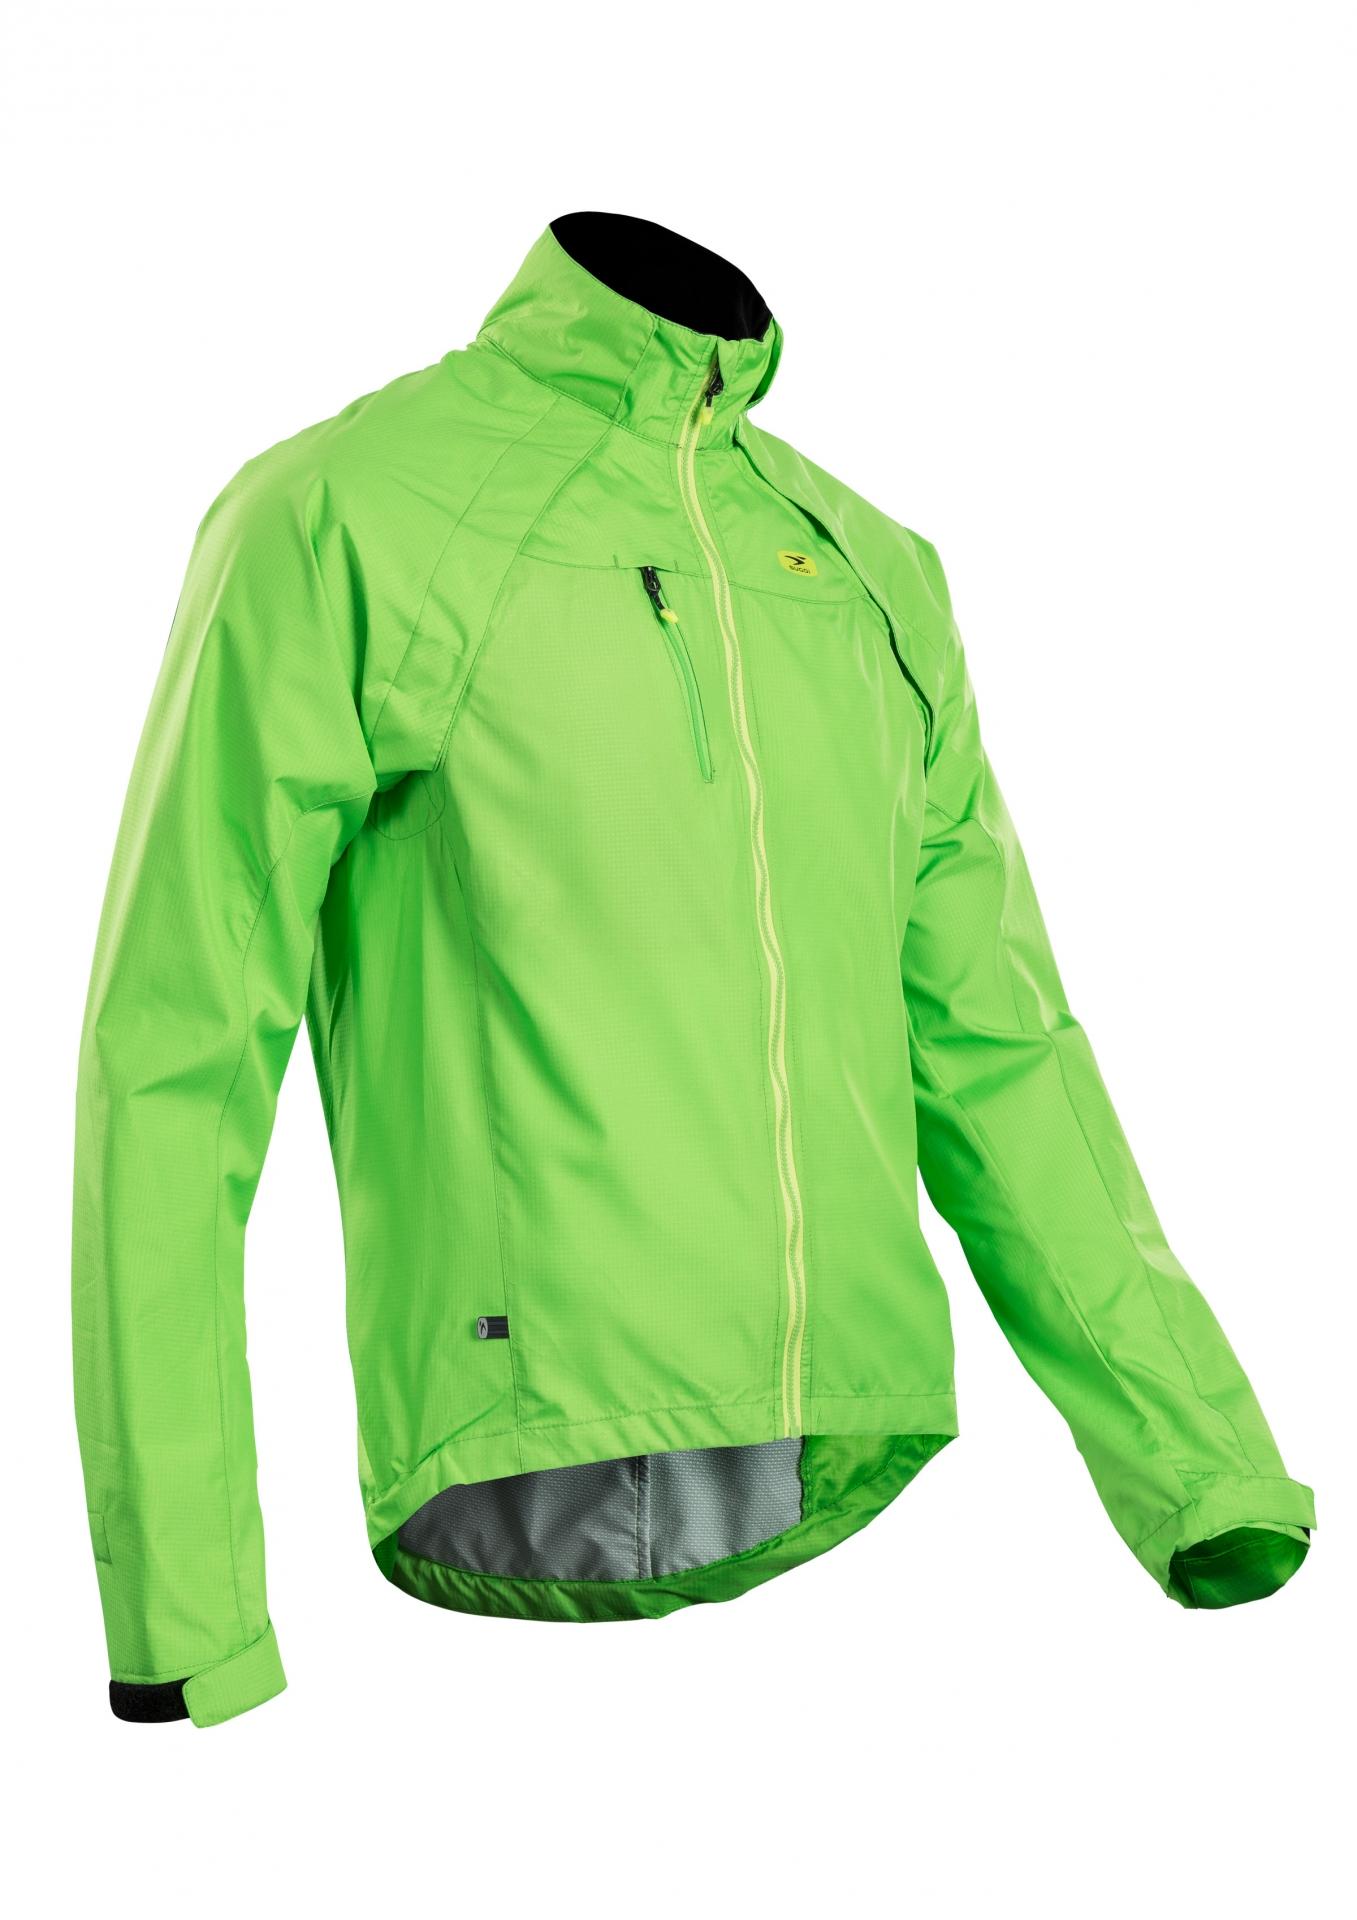 Veste à manches amovibles Sugoi Versa EVO Vert - M